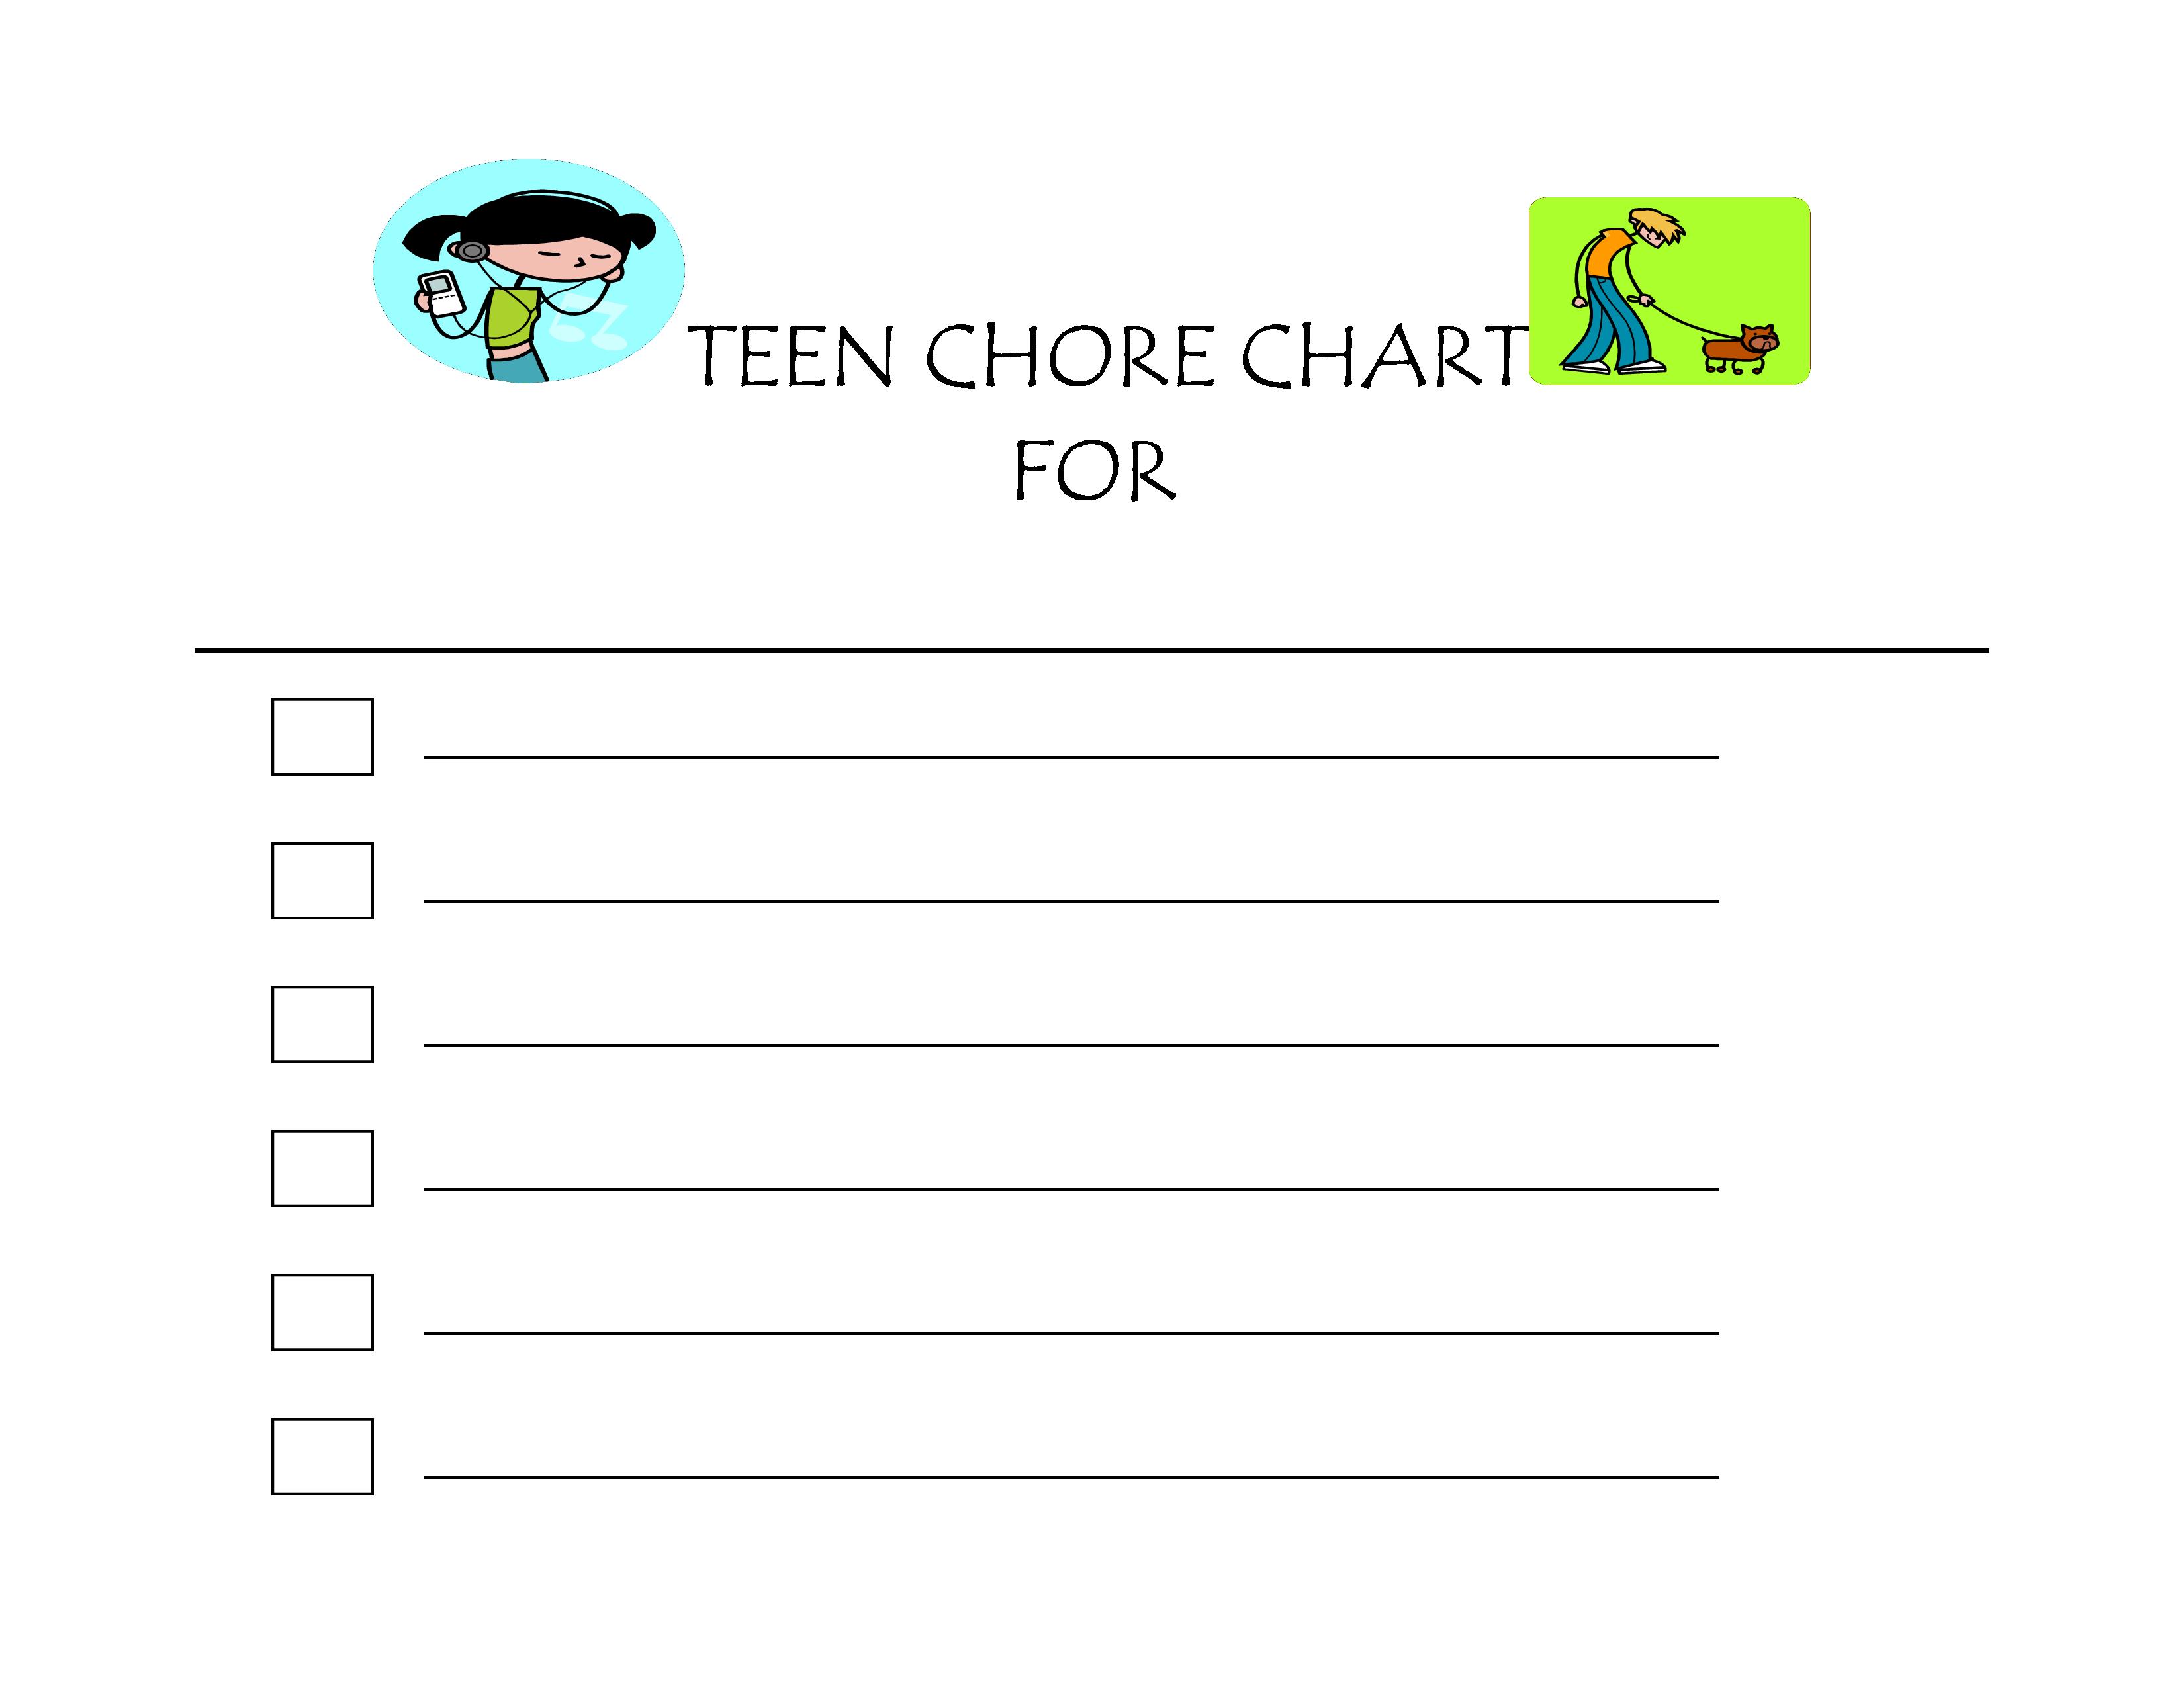 Teen Chore Chart Free Adobe PDF template - Teen Chore Chart Free ...